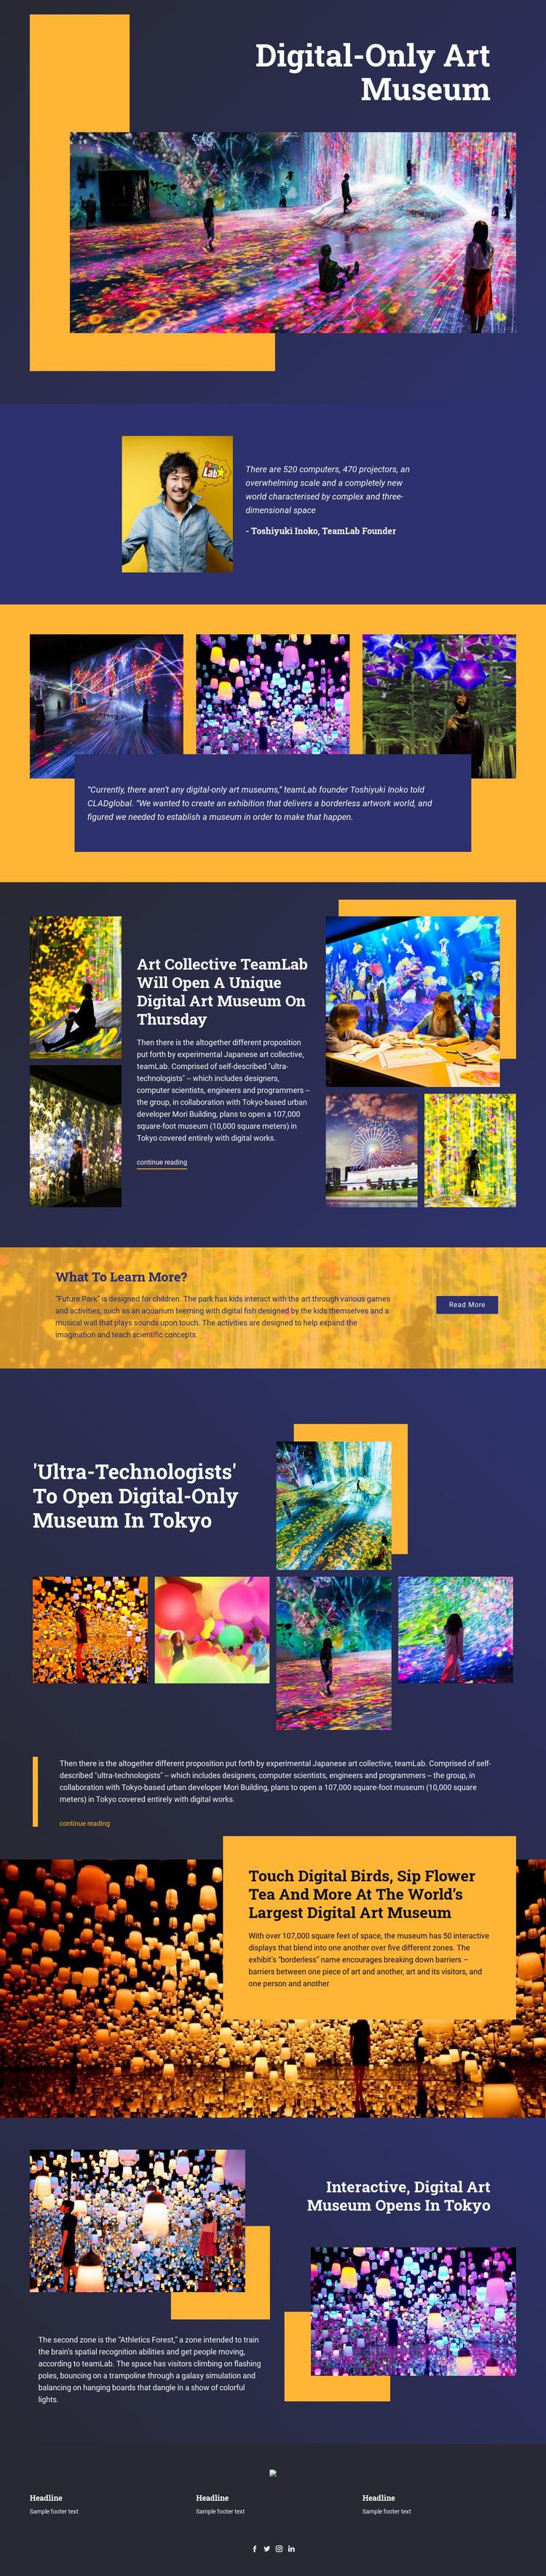 Digital Art Museum Homepage Design